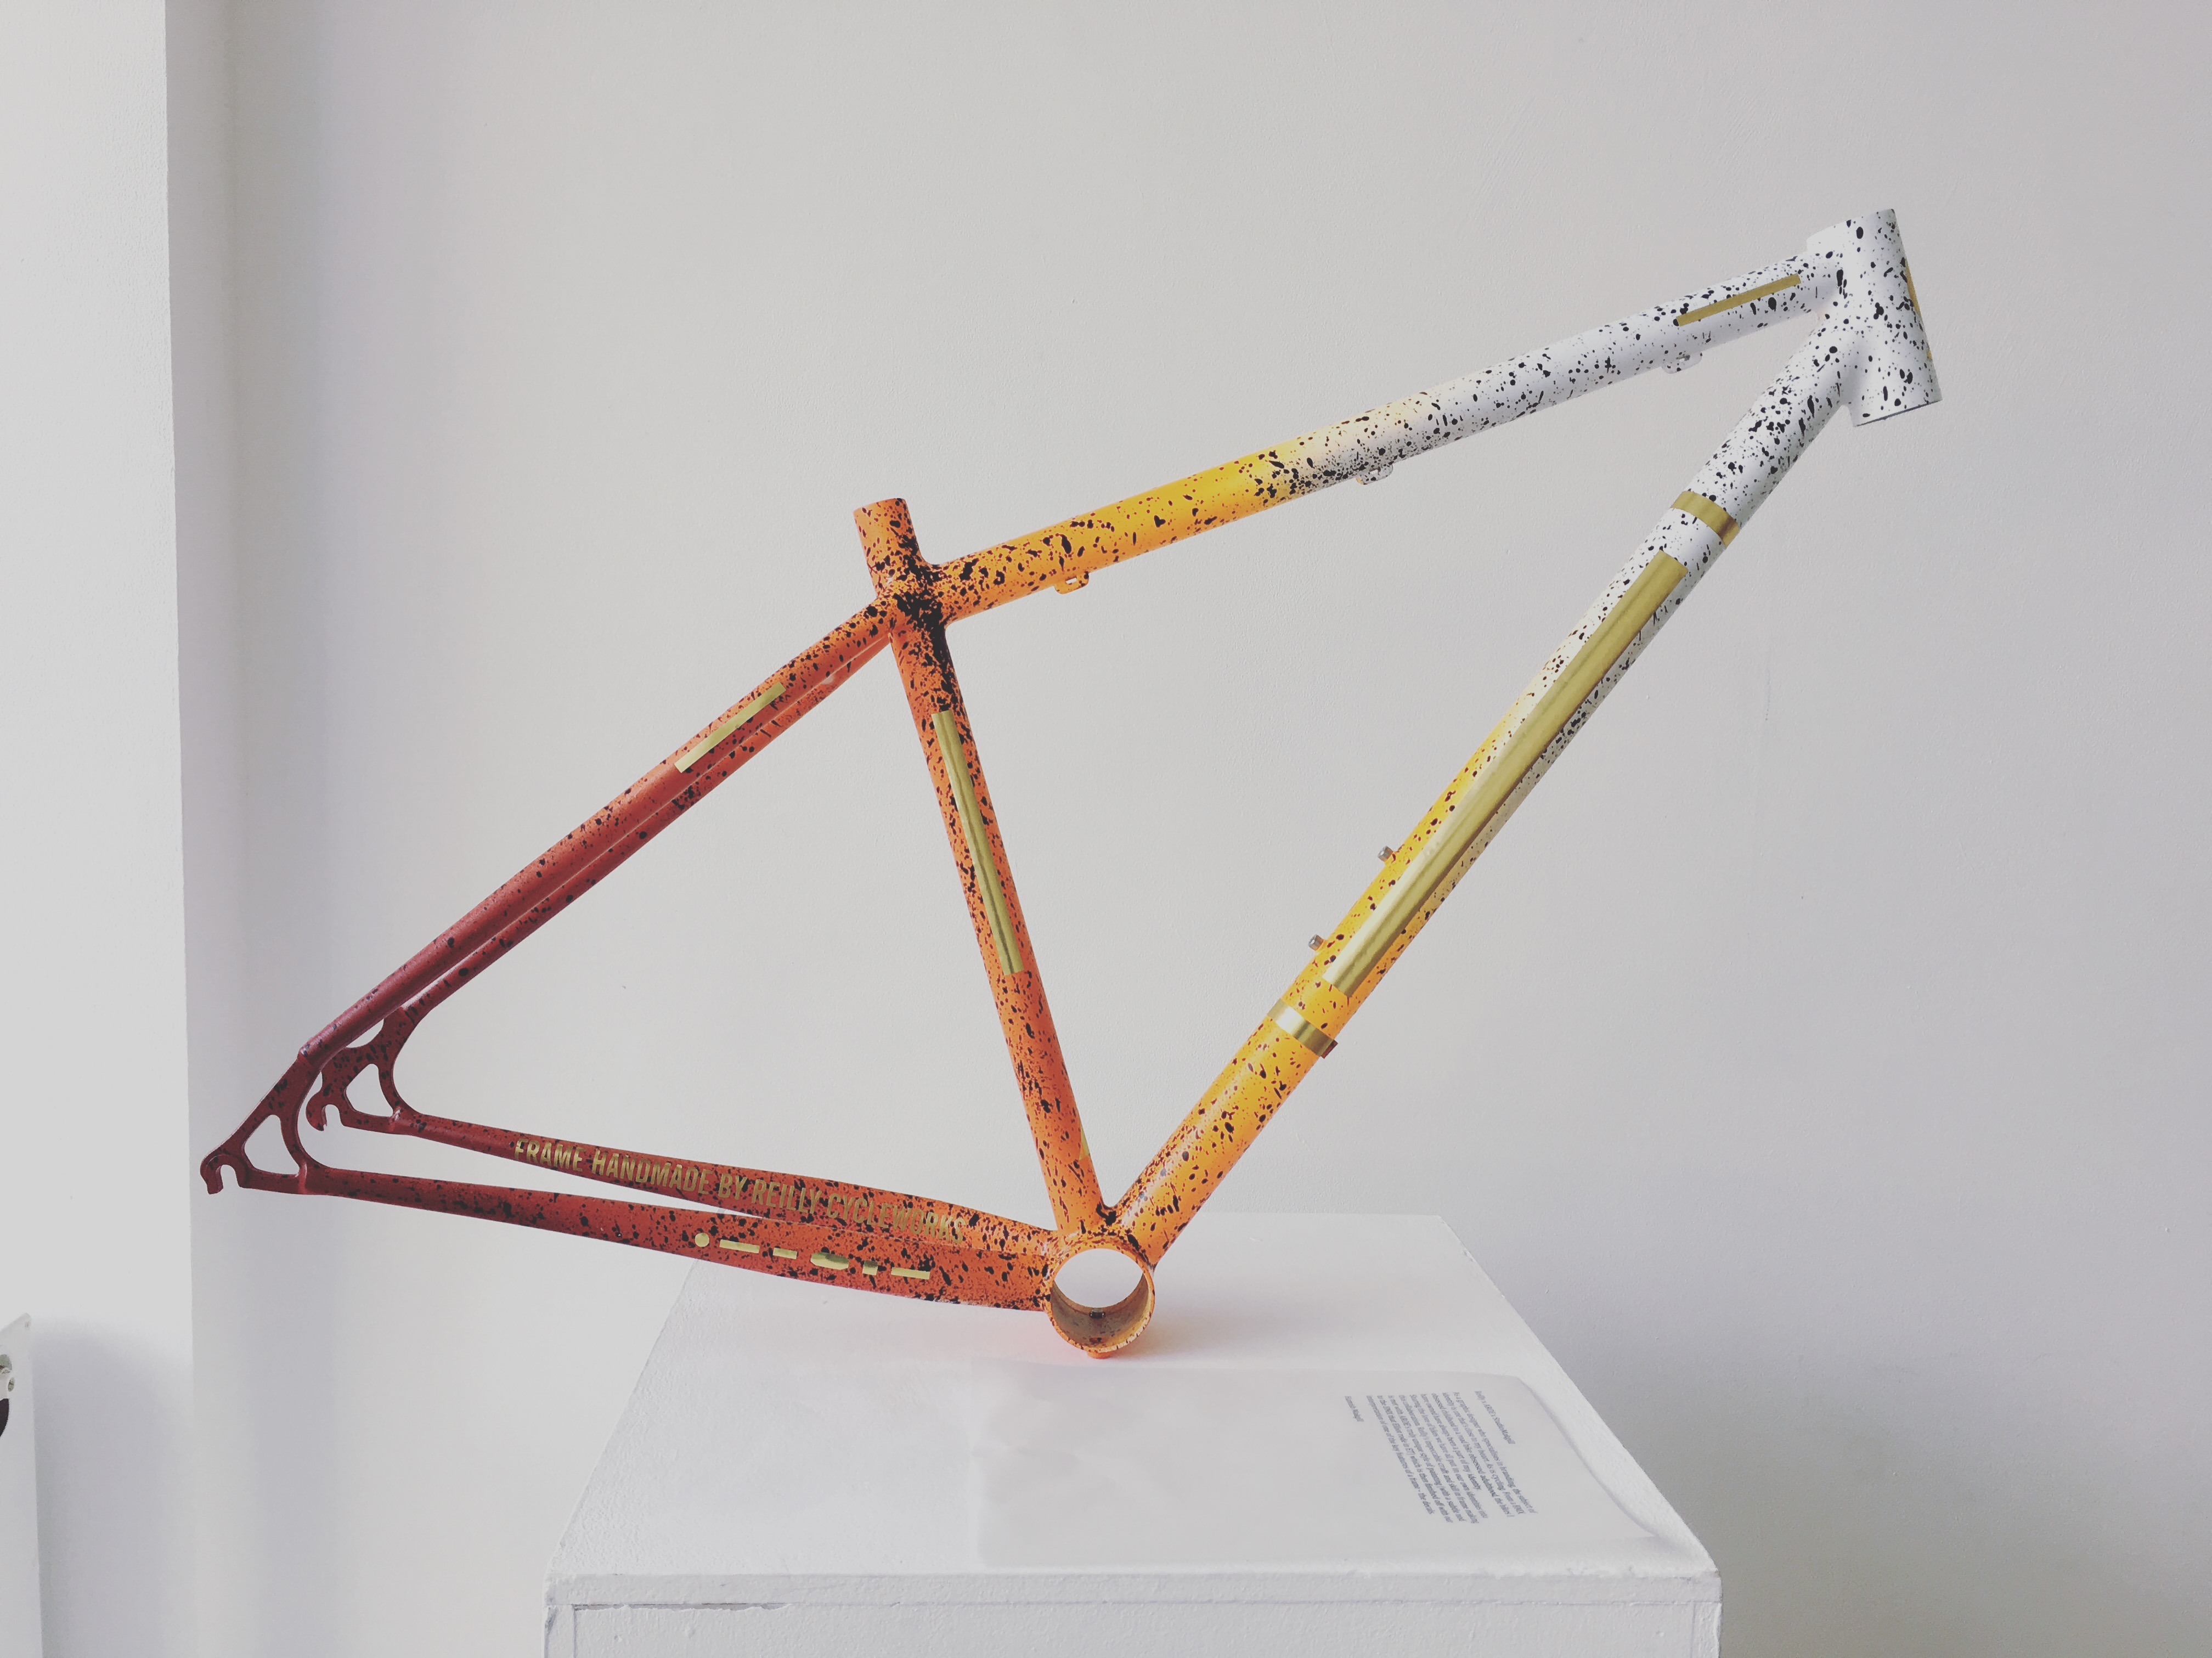 Reilly Bike Frame